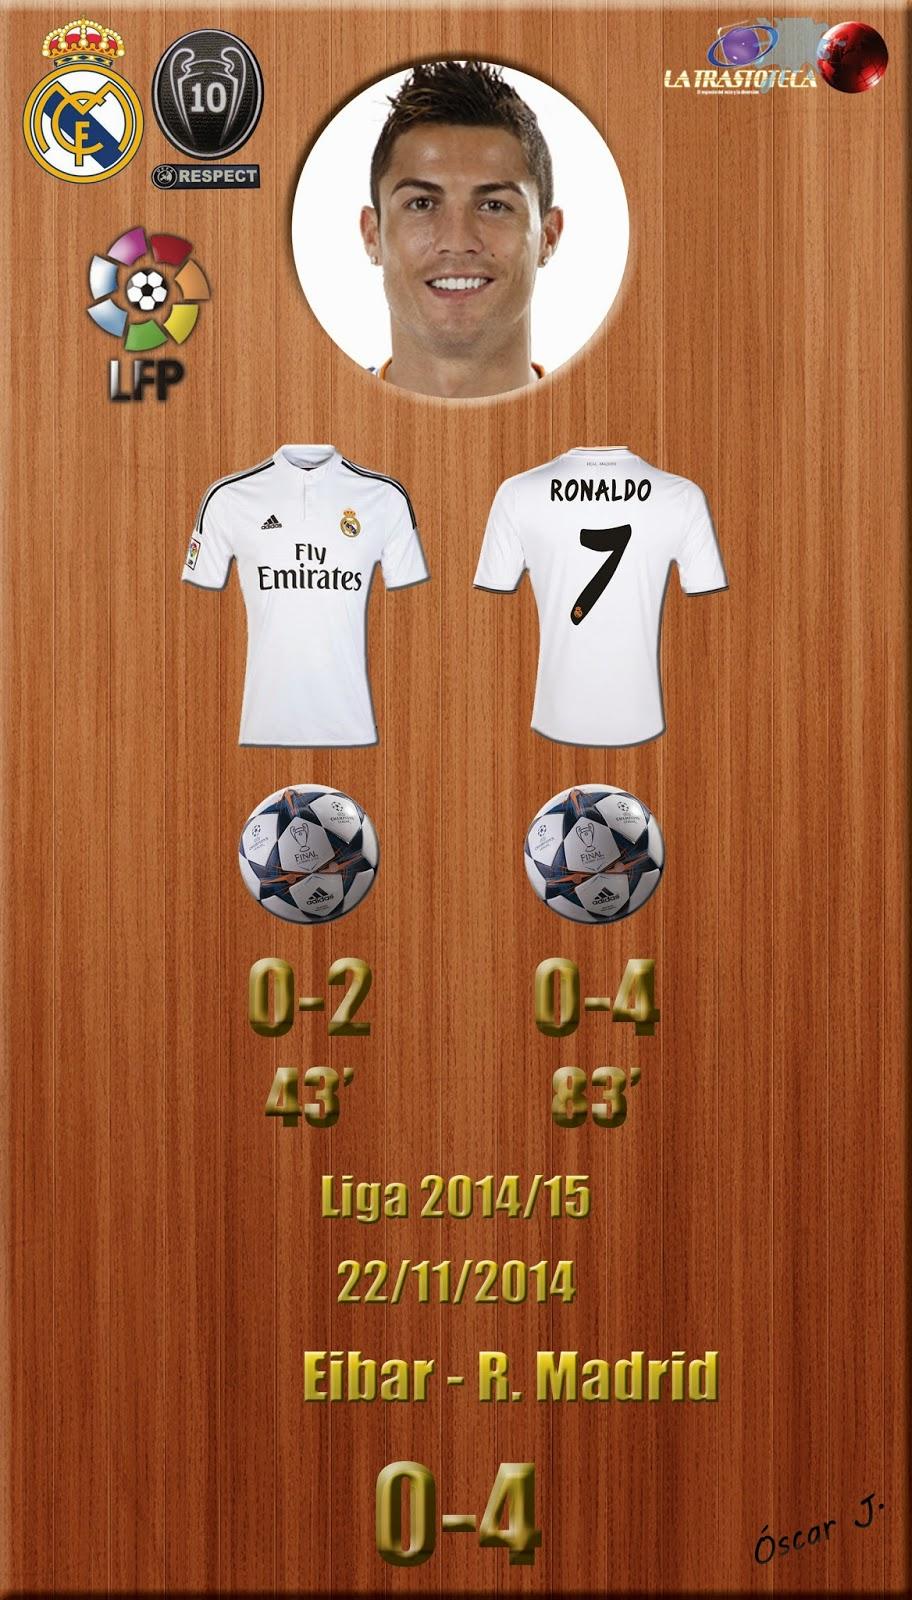 Cristiano Ronaldo - Doblete - Eibar 0-4 Real Madrid - Liga 2014/15 - Jornada 12 - (22/11/2014)